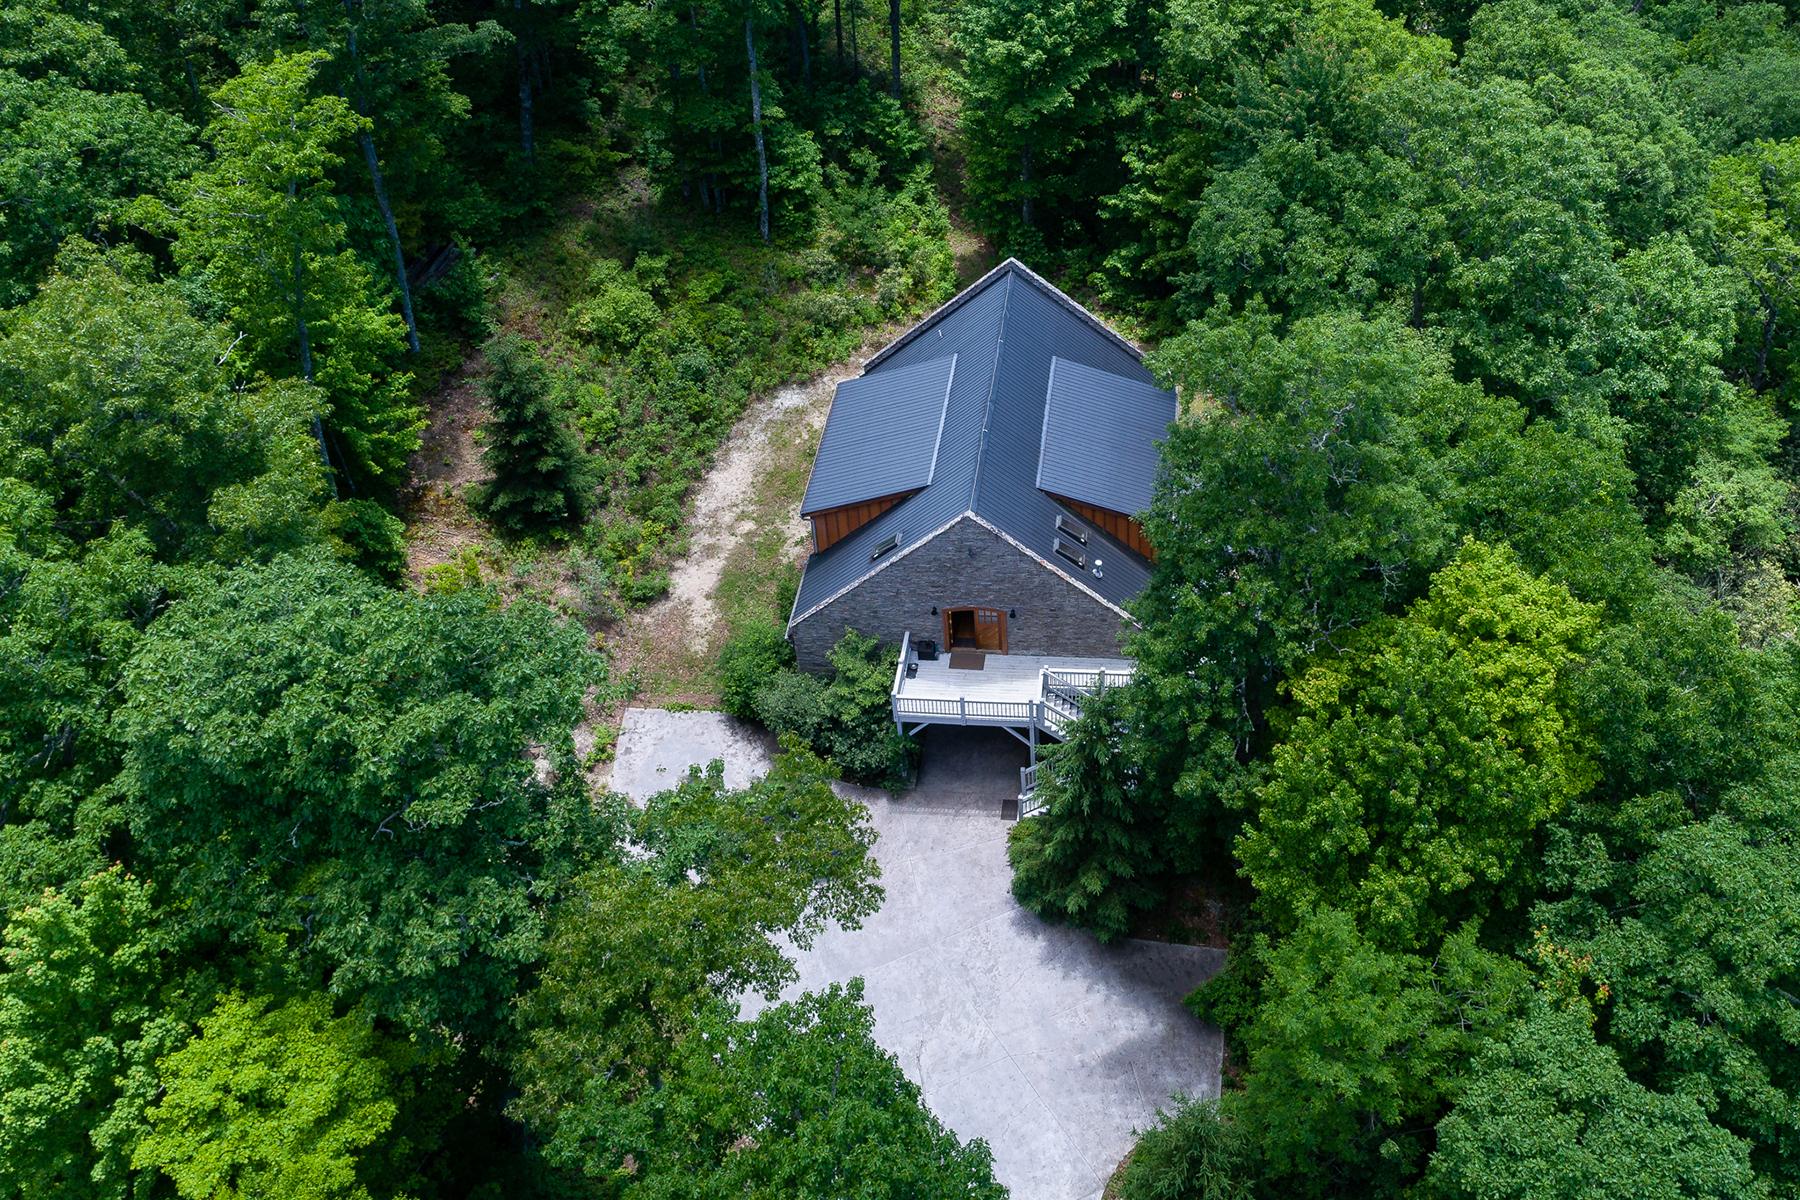 Single Family Home for Active at GLENVILLE 532 Fox Knob Drive Glenville, North Carolina 28736 United States